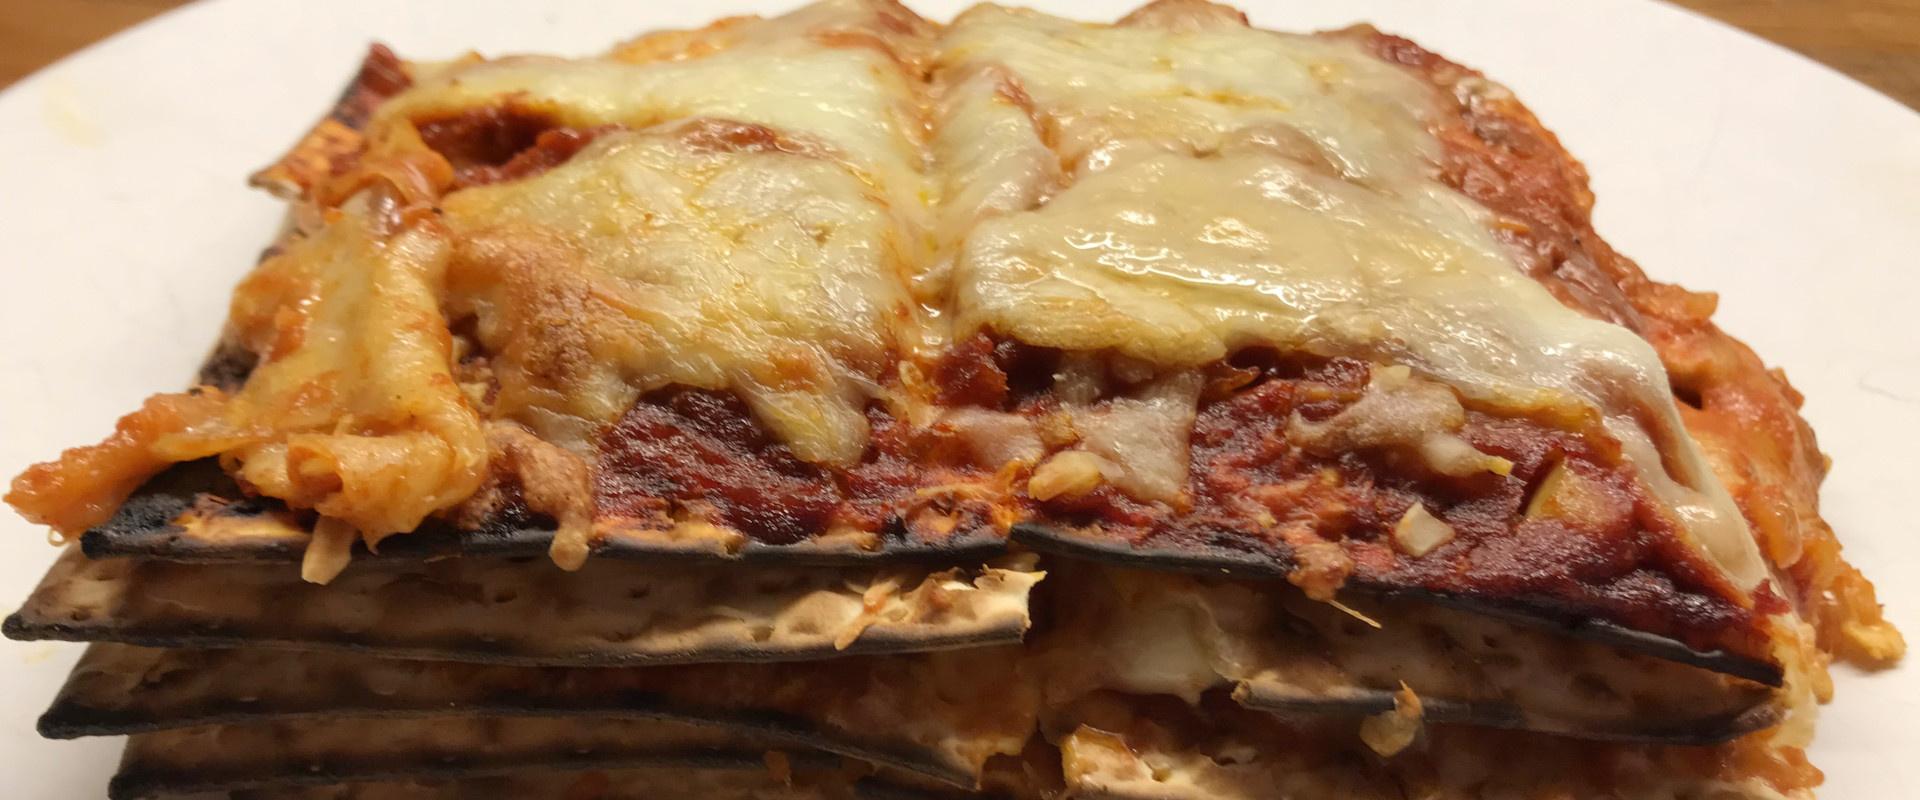 macesz lasagne cover